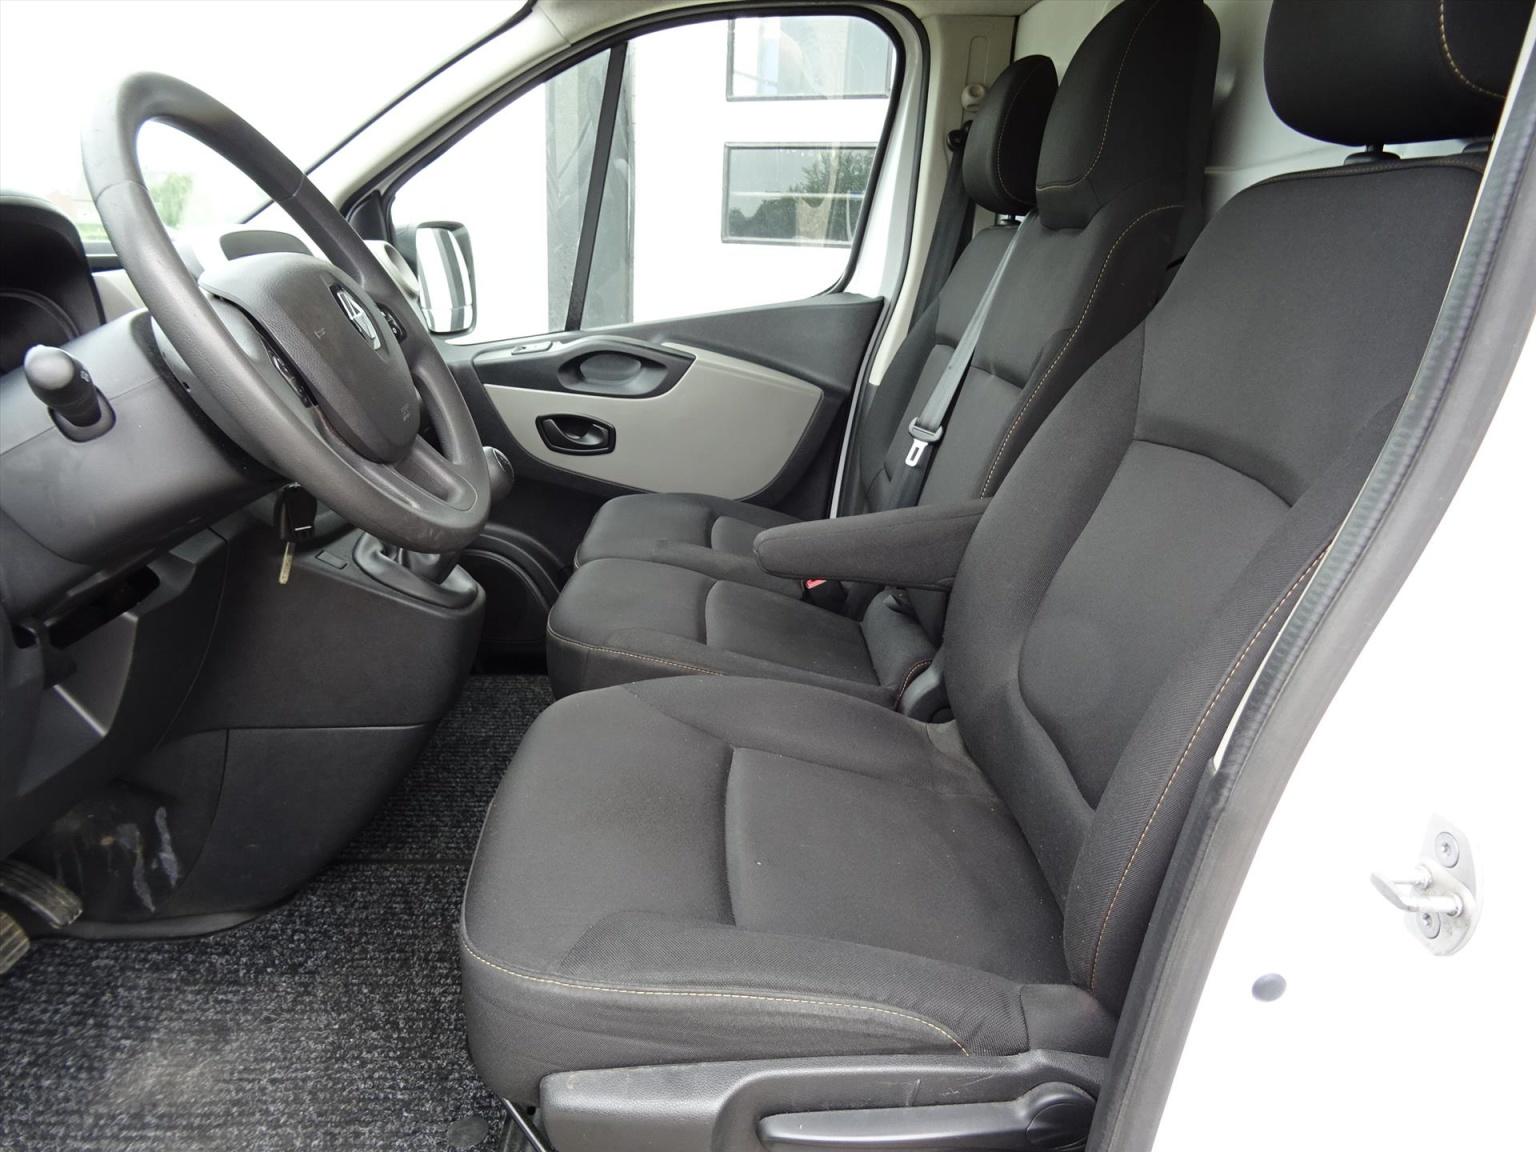 Renault-Trafic-8